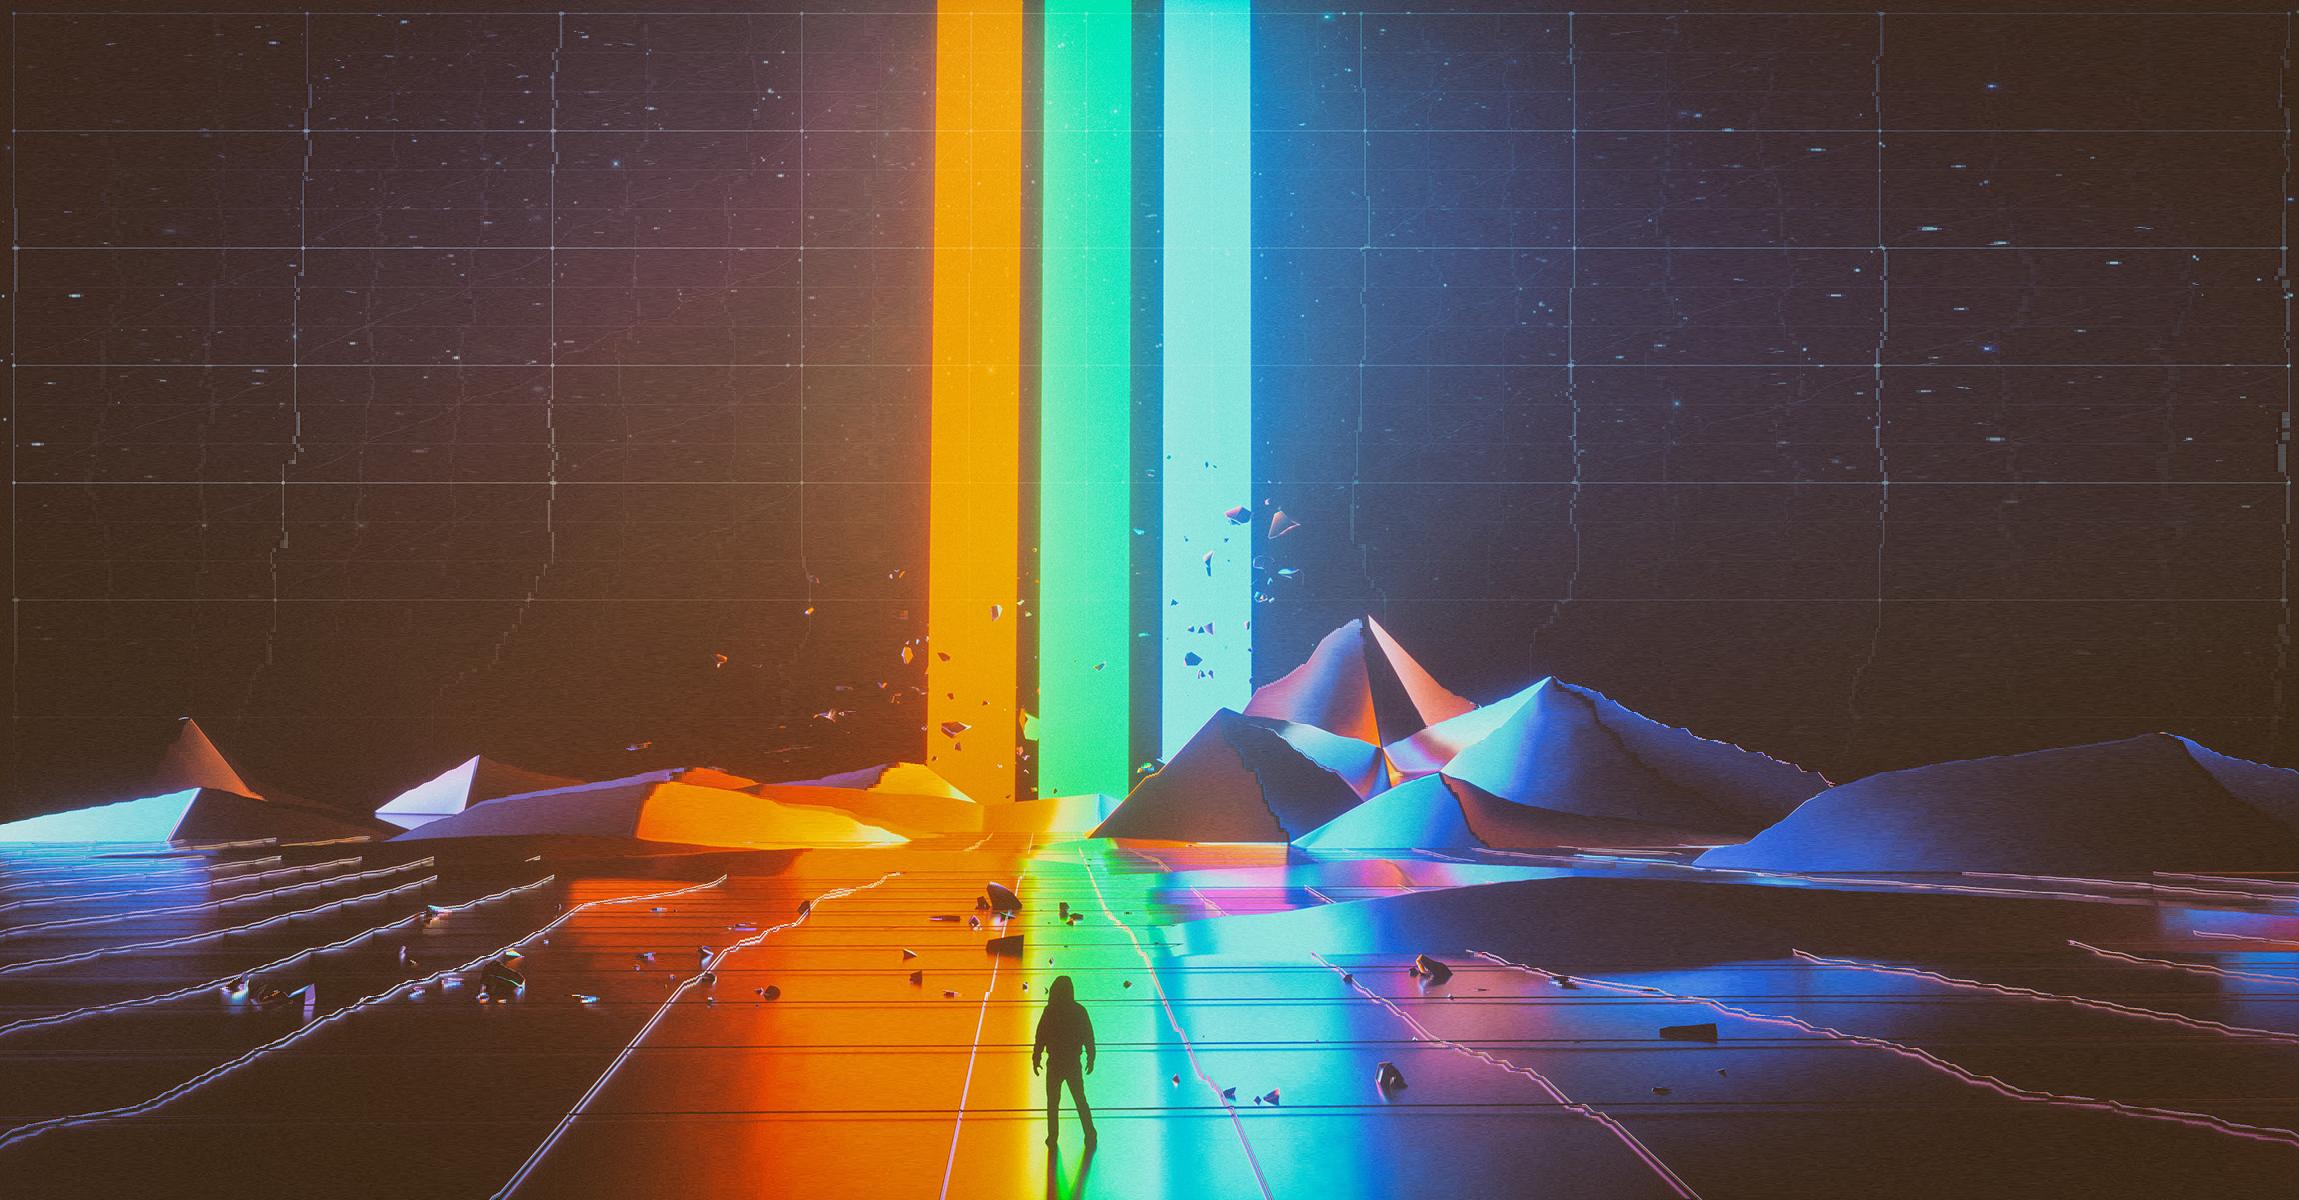 Imagine Dragons Wallpaper Ideas – Use Your Imagination